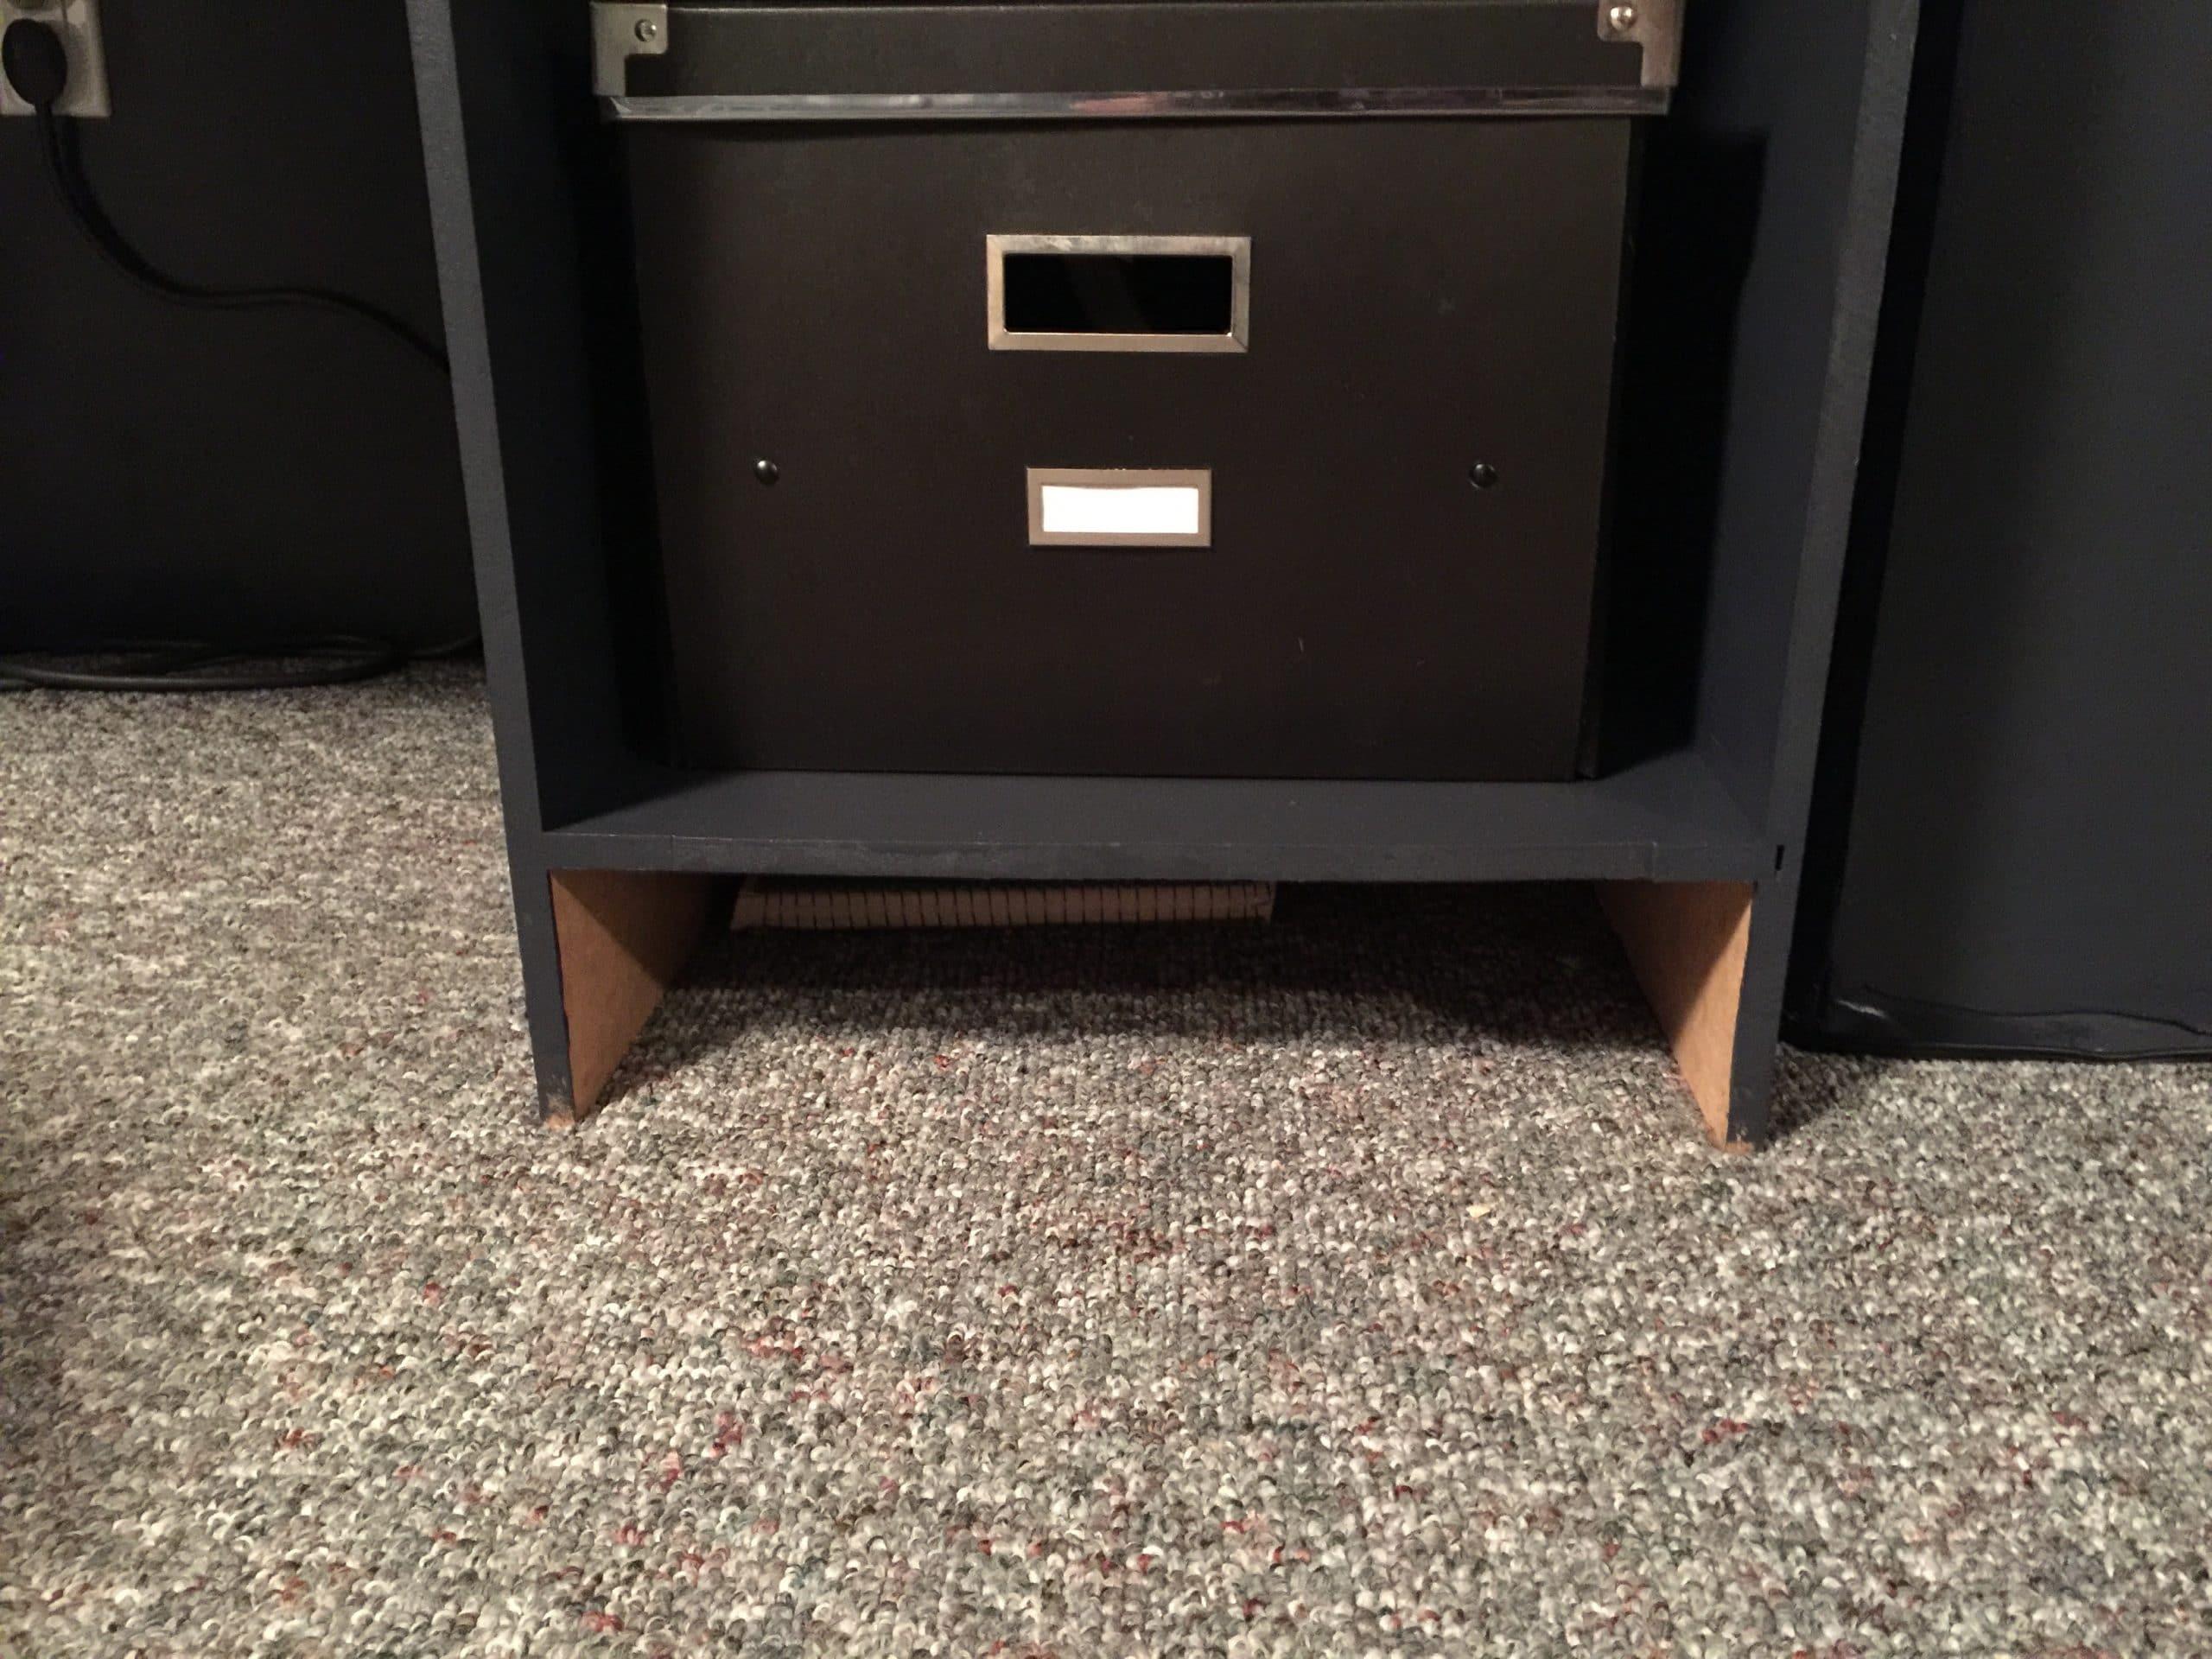 Kick Plates For Cabinets Cabinet Kick Plates Goodstuffathome